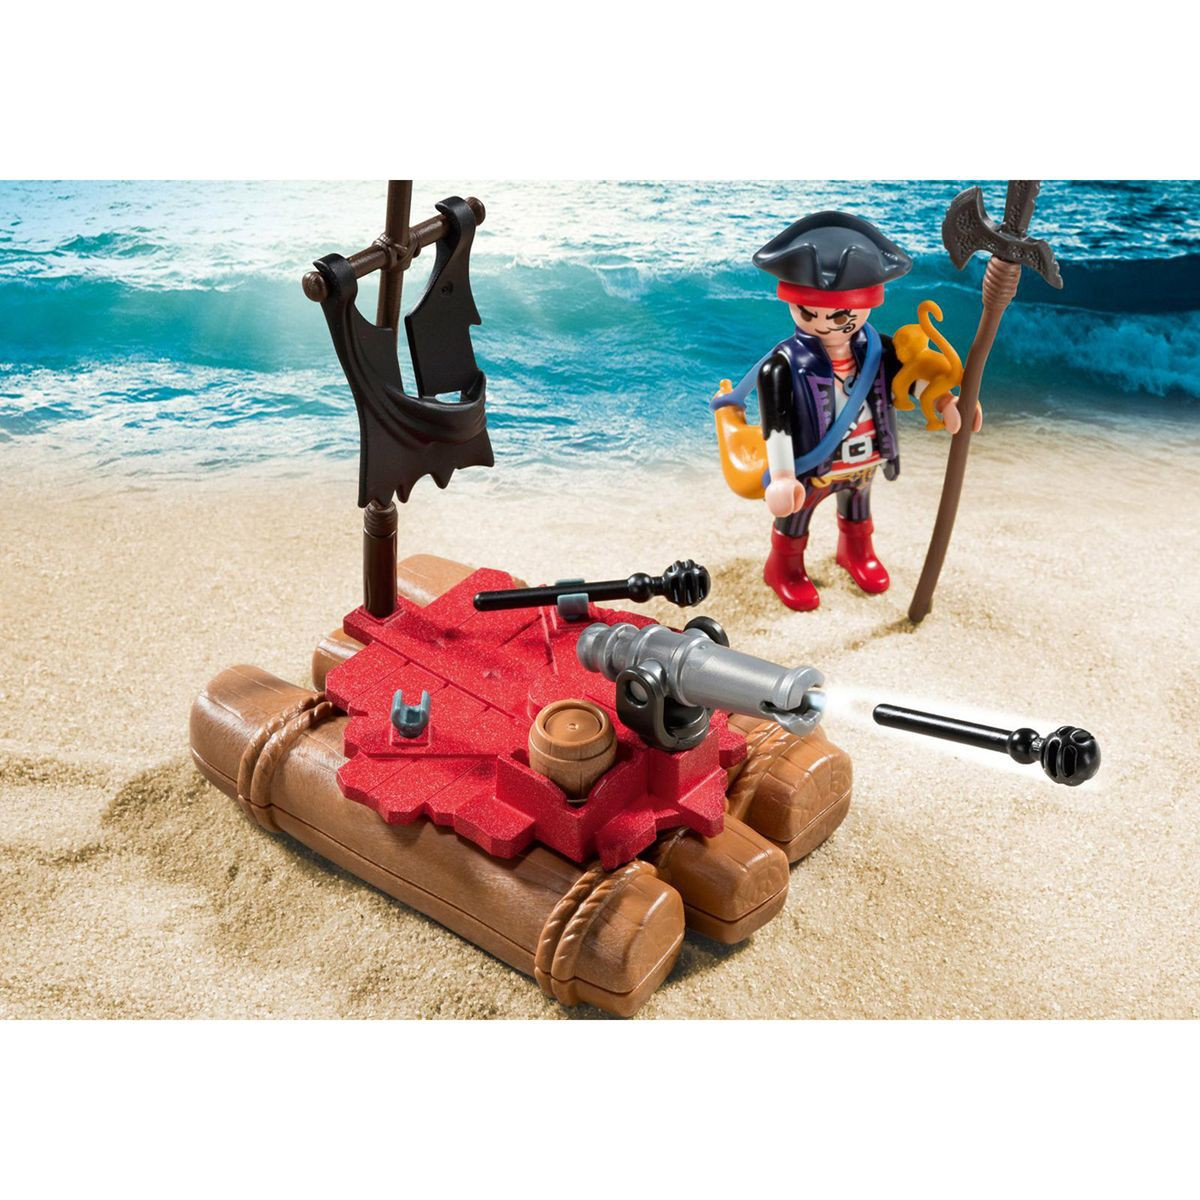 Playmobil radeau pirate